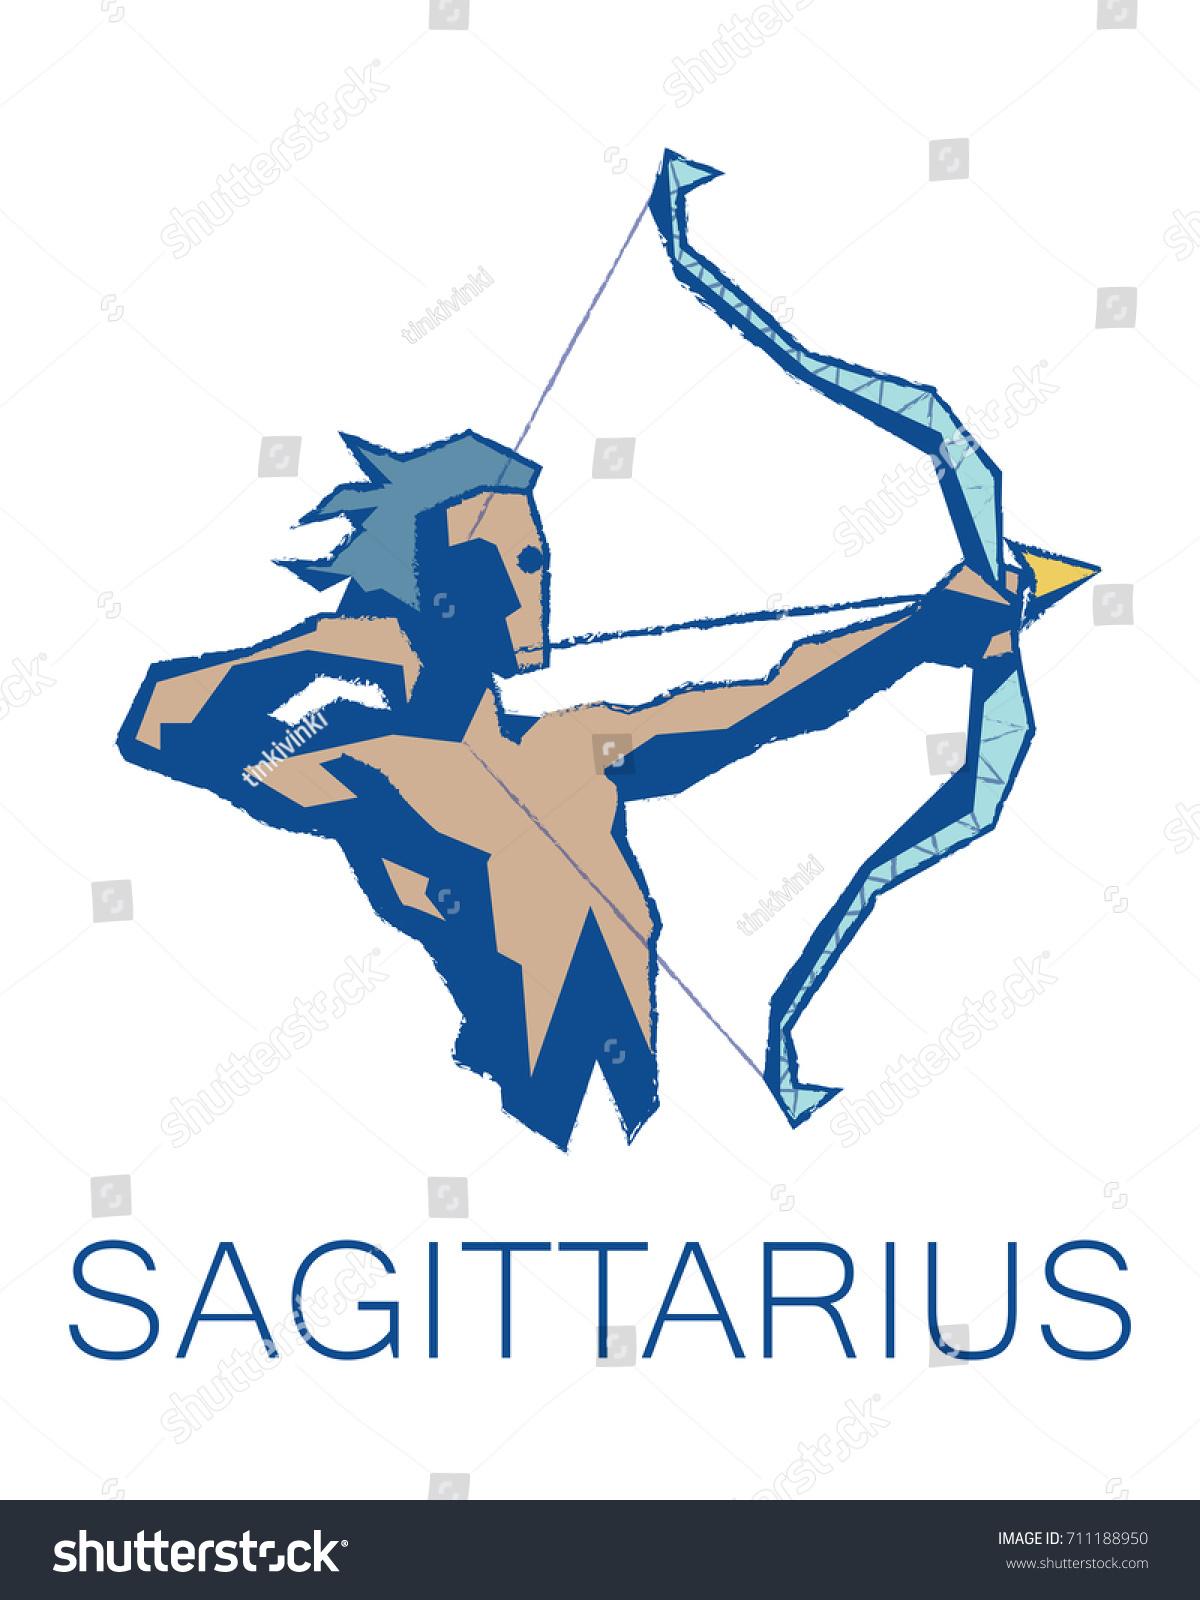 Sagittarius zodiac sign astrology symbol illustration stock sagittarius zodiac sign astrology symbol illustration in flat polygonal style element for your biocorpaavc